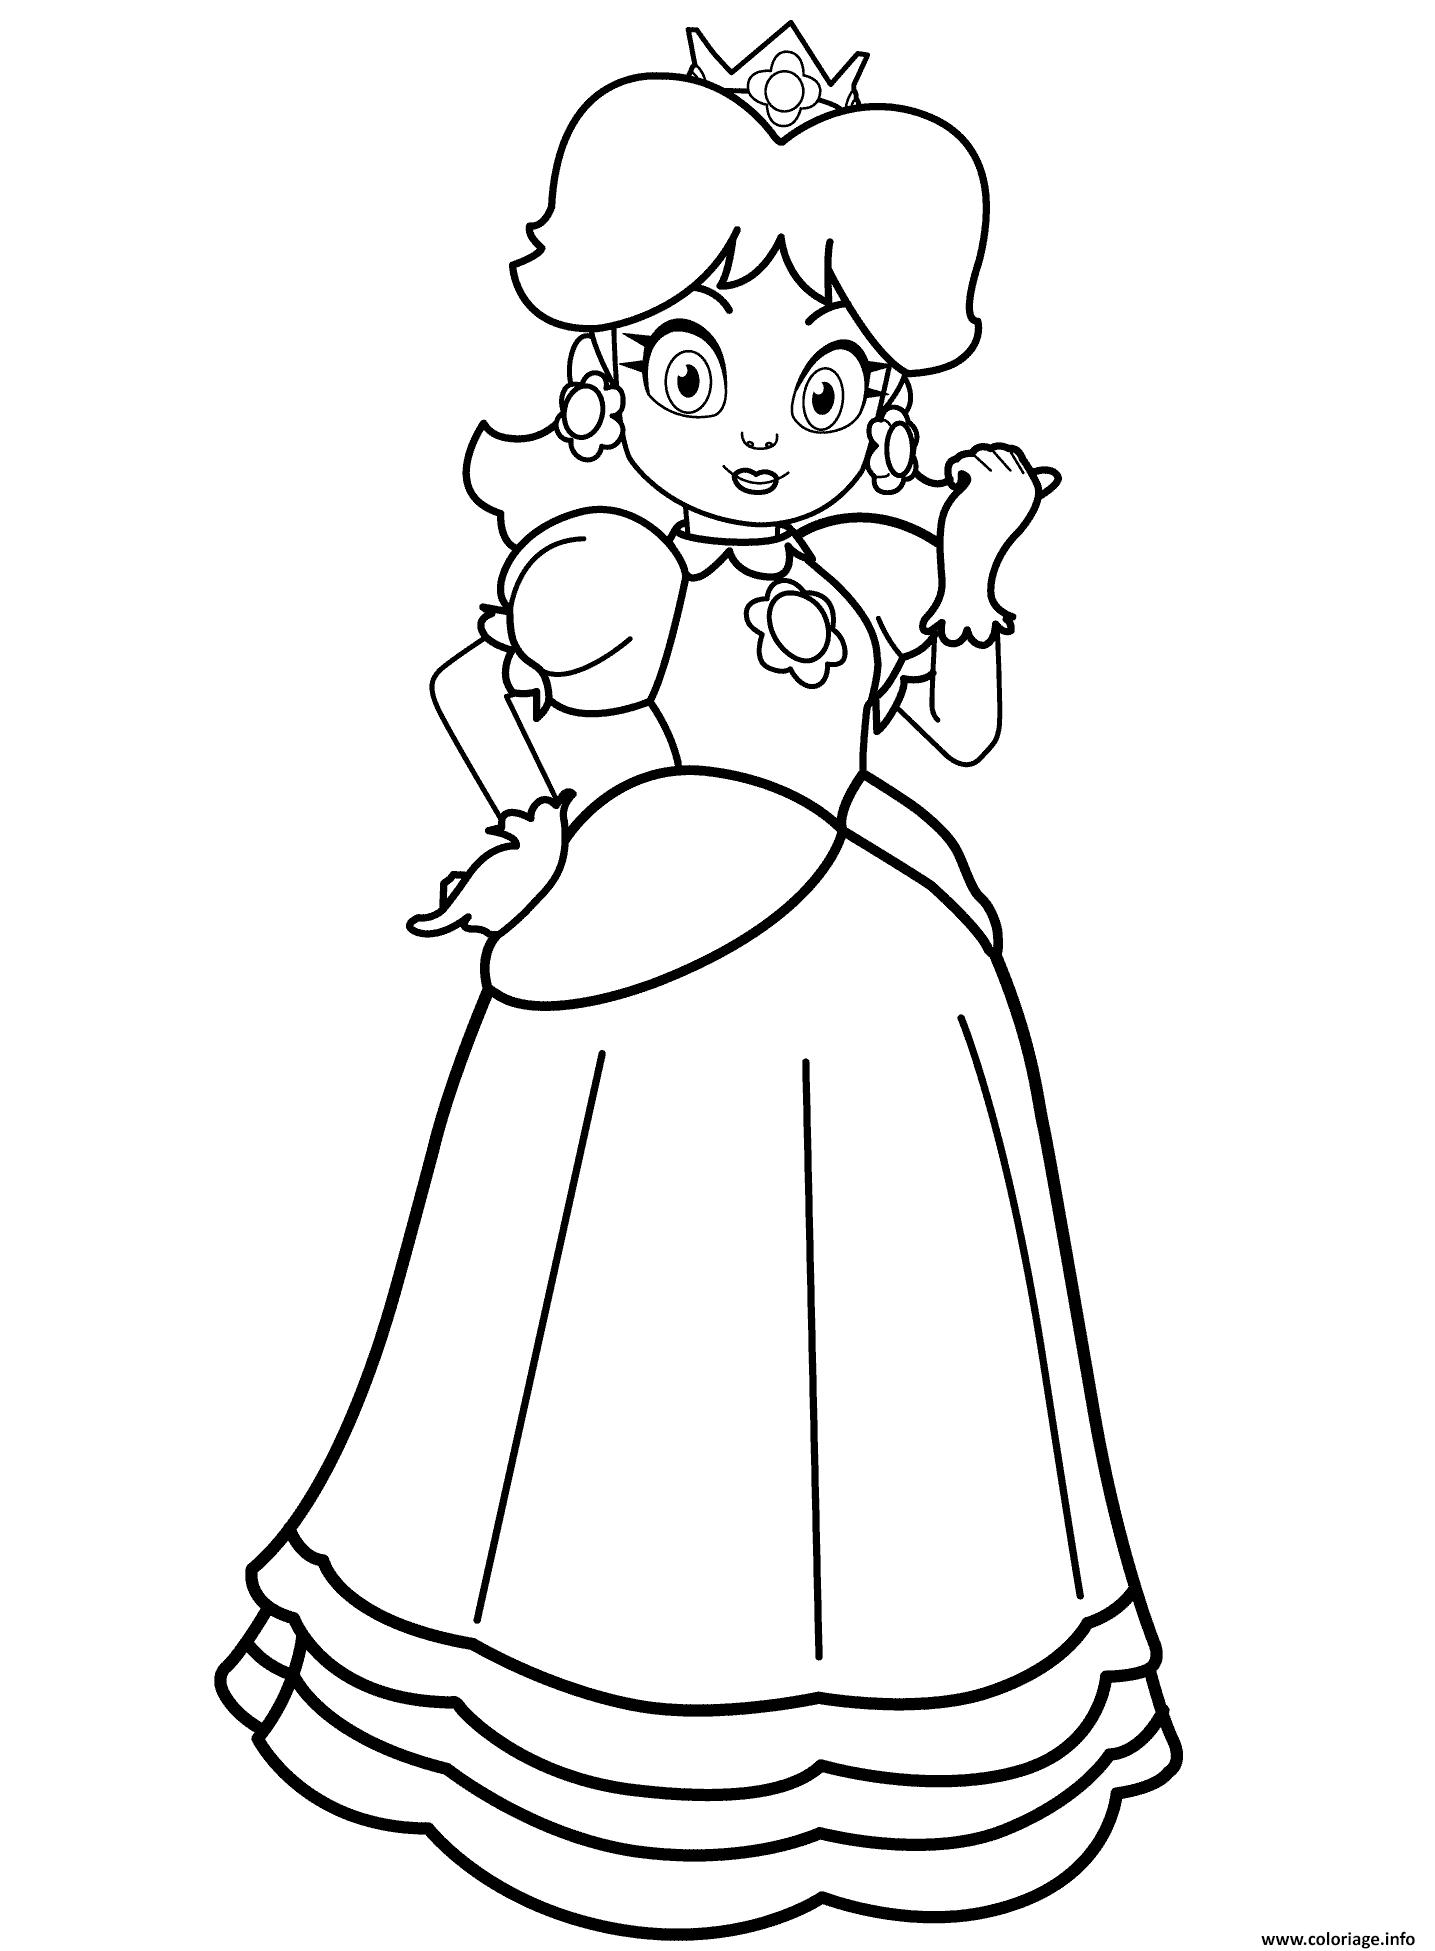 Coloriage Princess Daisy Jecolorie Com